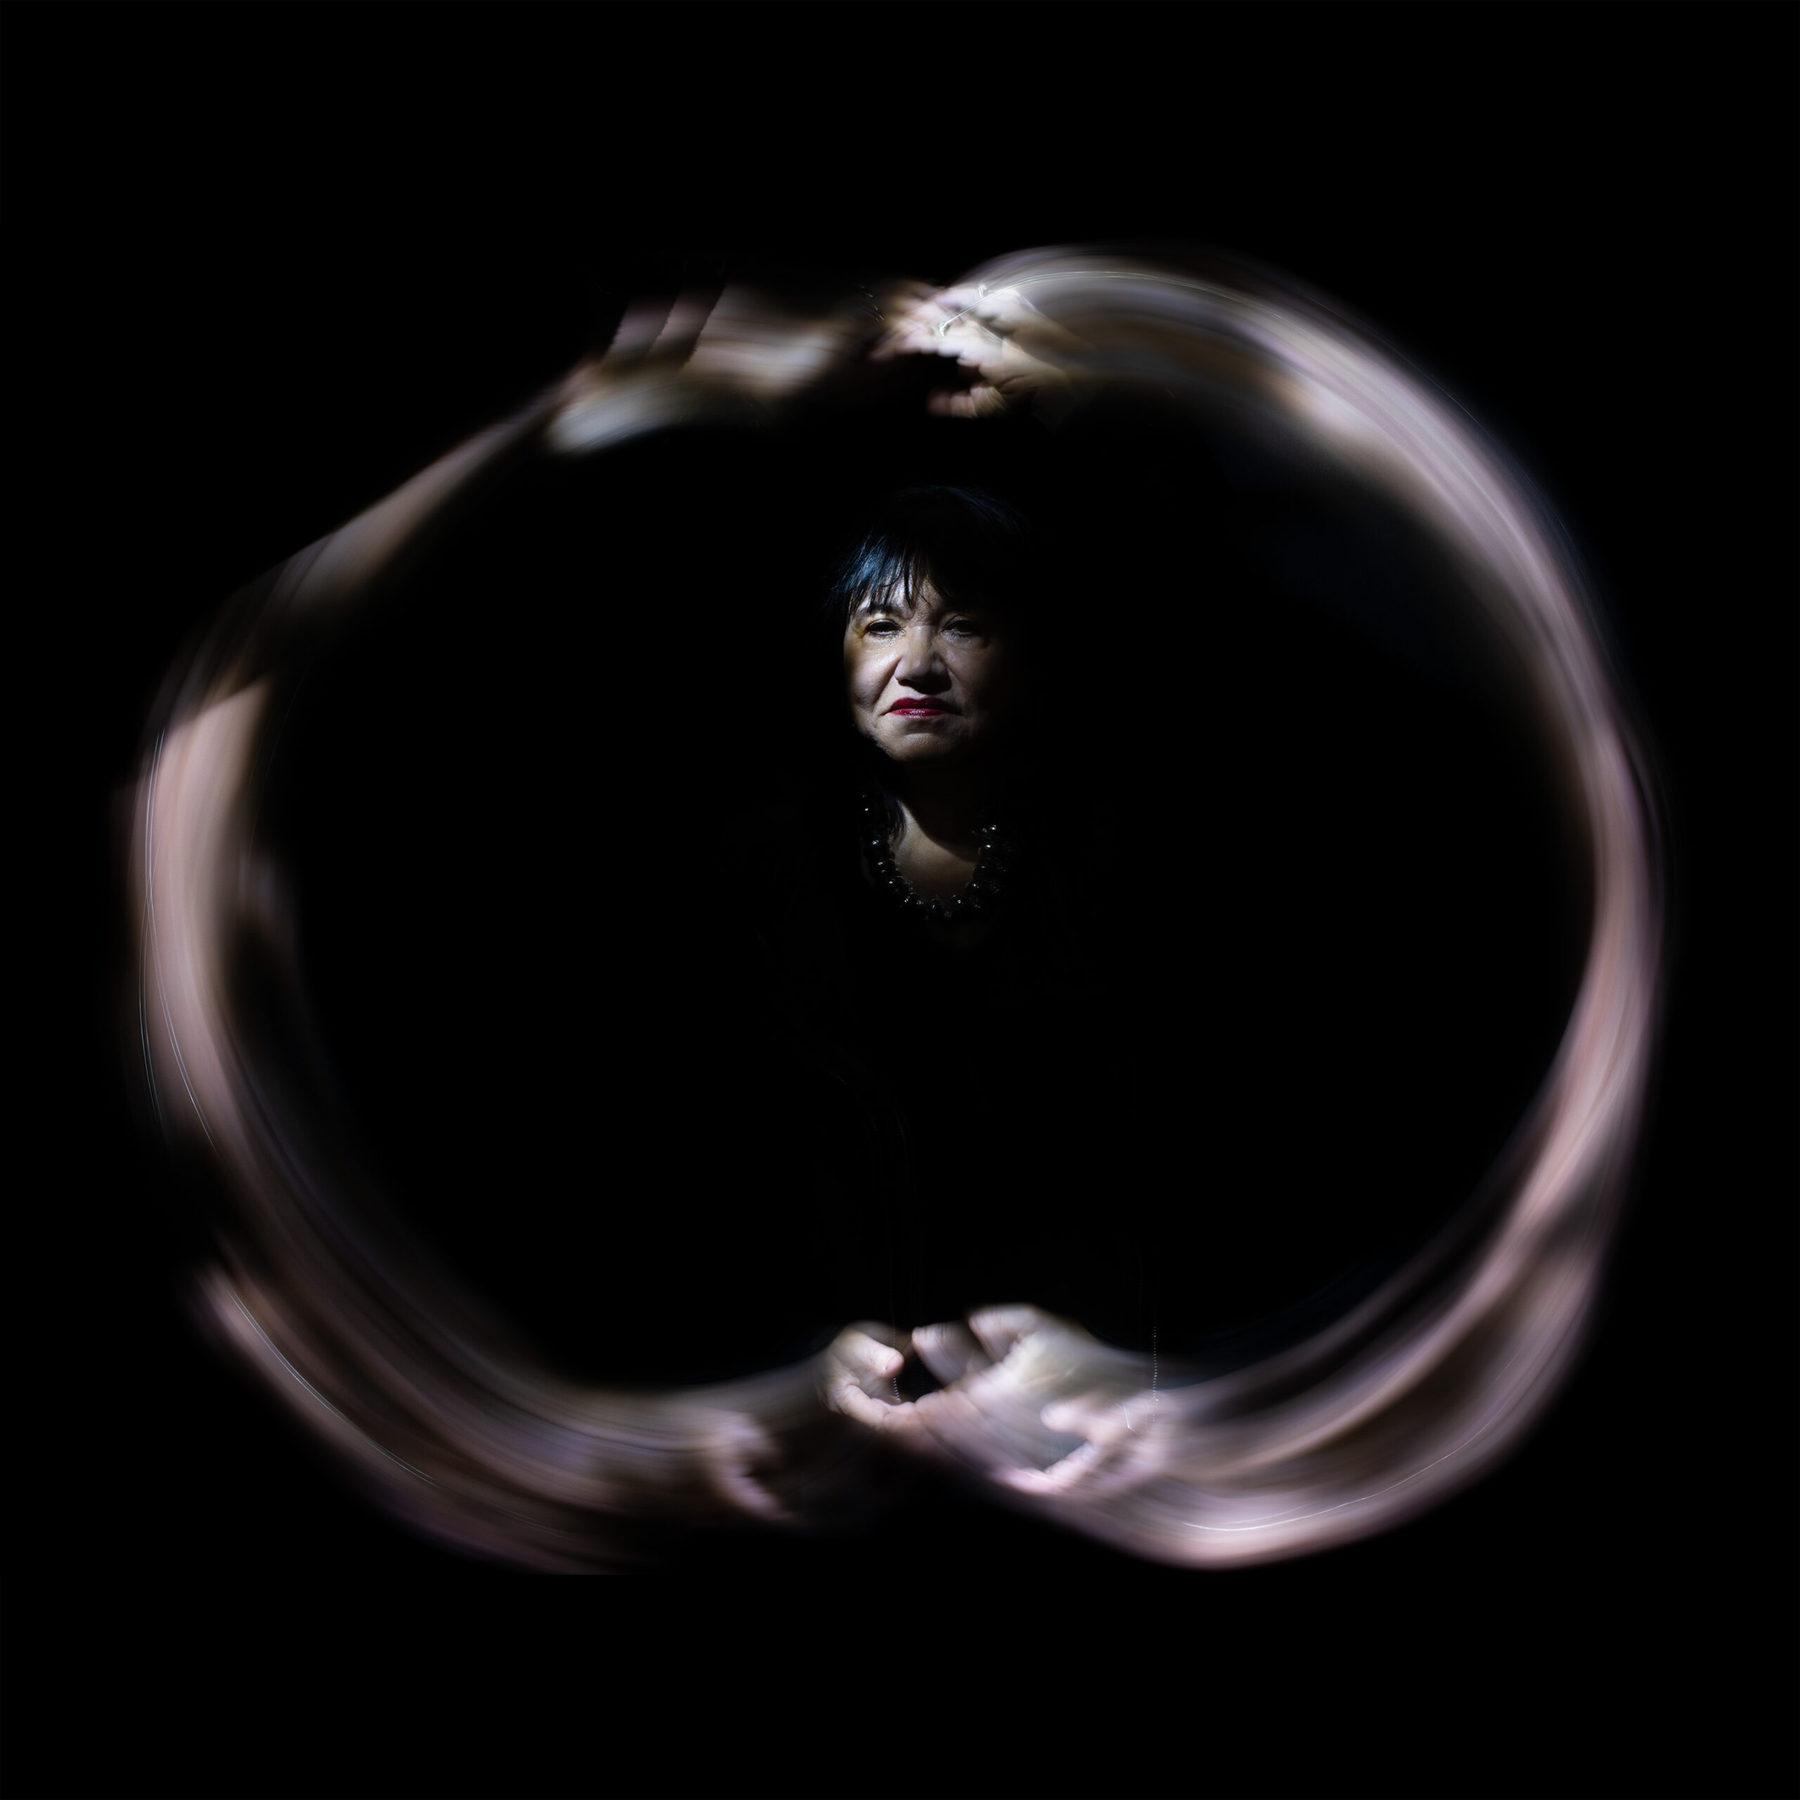 ALISKA LAHUSEN by Claire Clelia Baldo